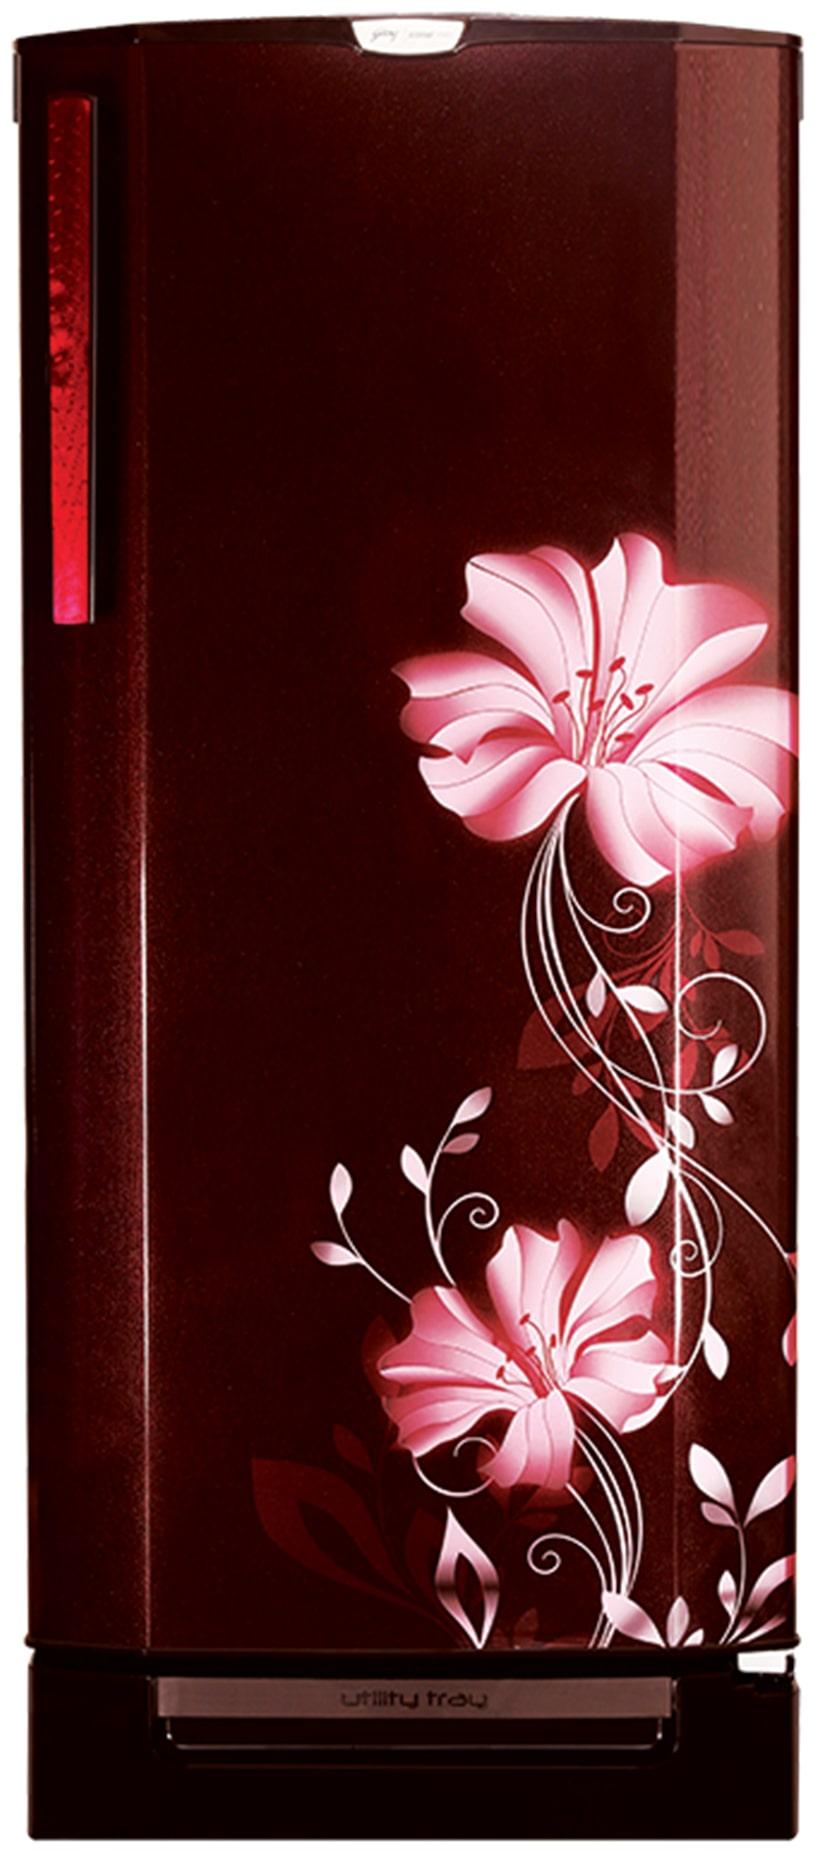 Godrej 190 L Direct Cool Single Door 4 Star Refrigerator (RD EDGEPRO 190 CT 4.2, Iris Wine)